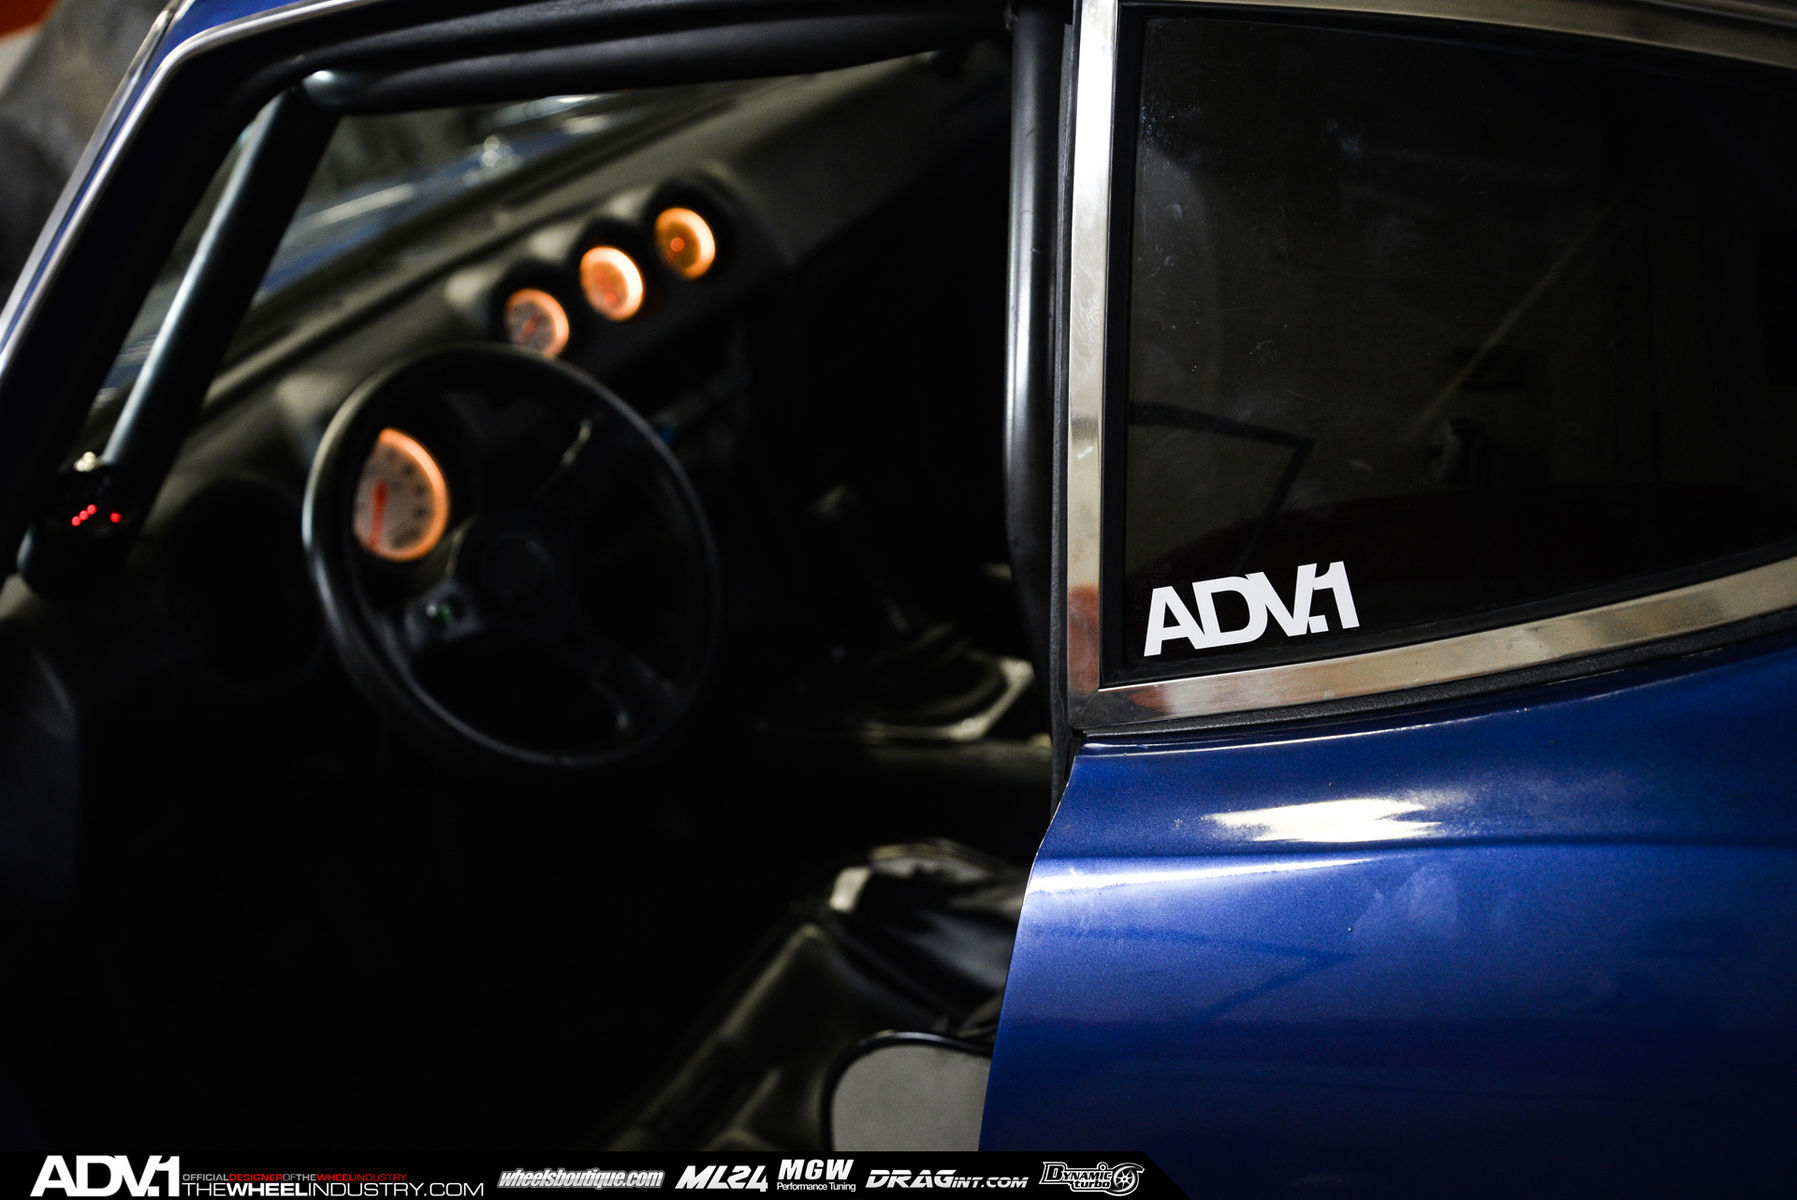 1978 Nissan    Project 2ADV.1: 1978 Datsun 280Z